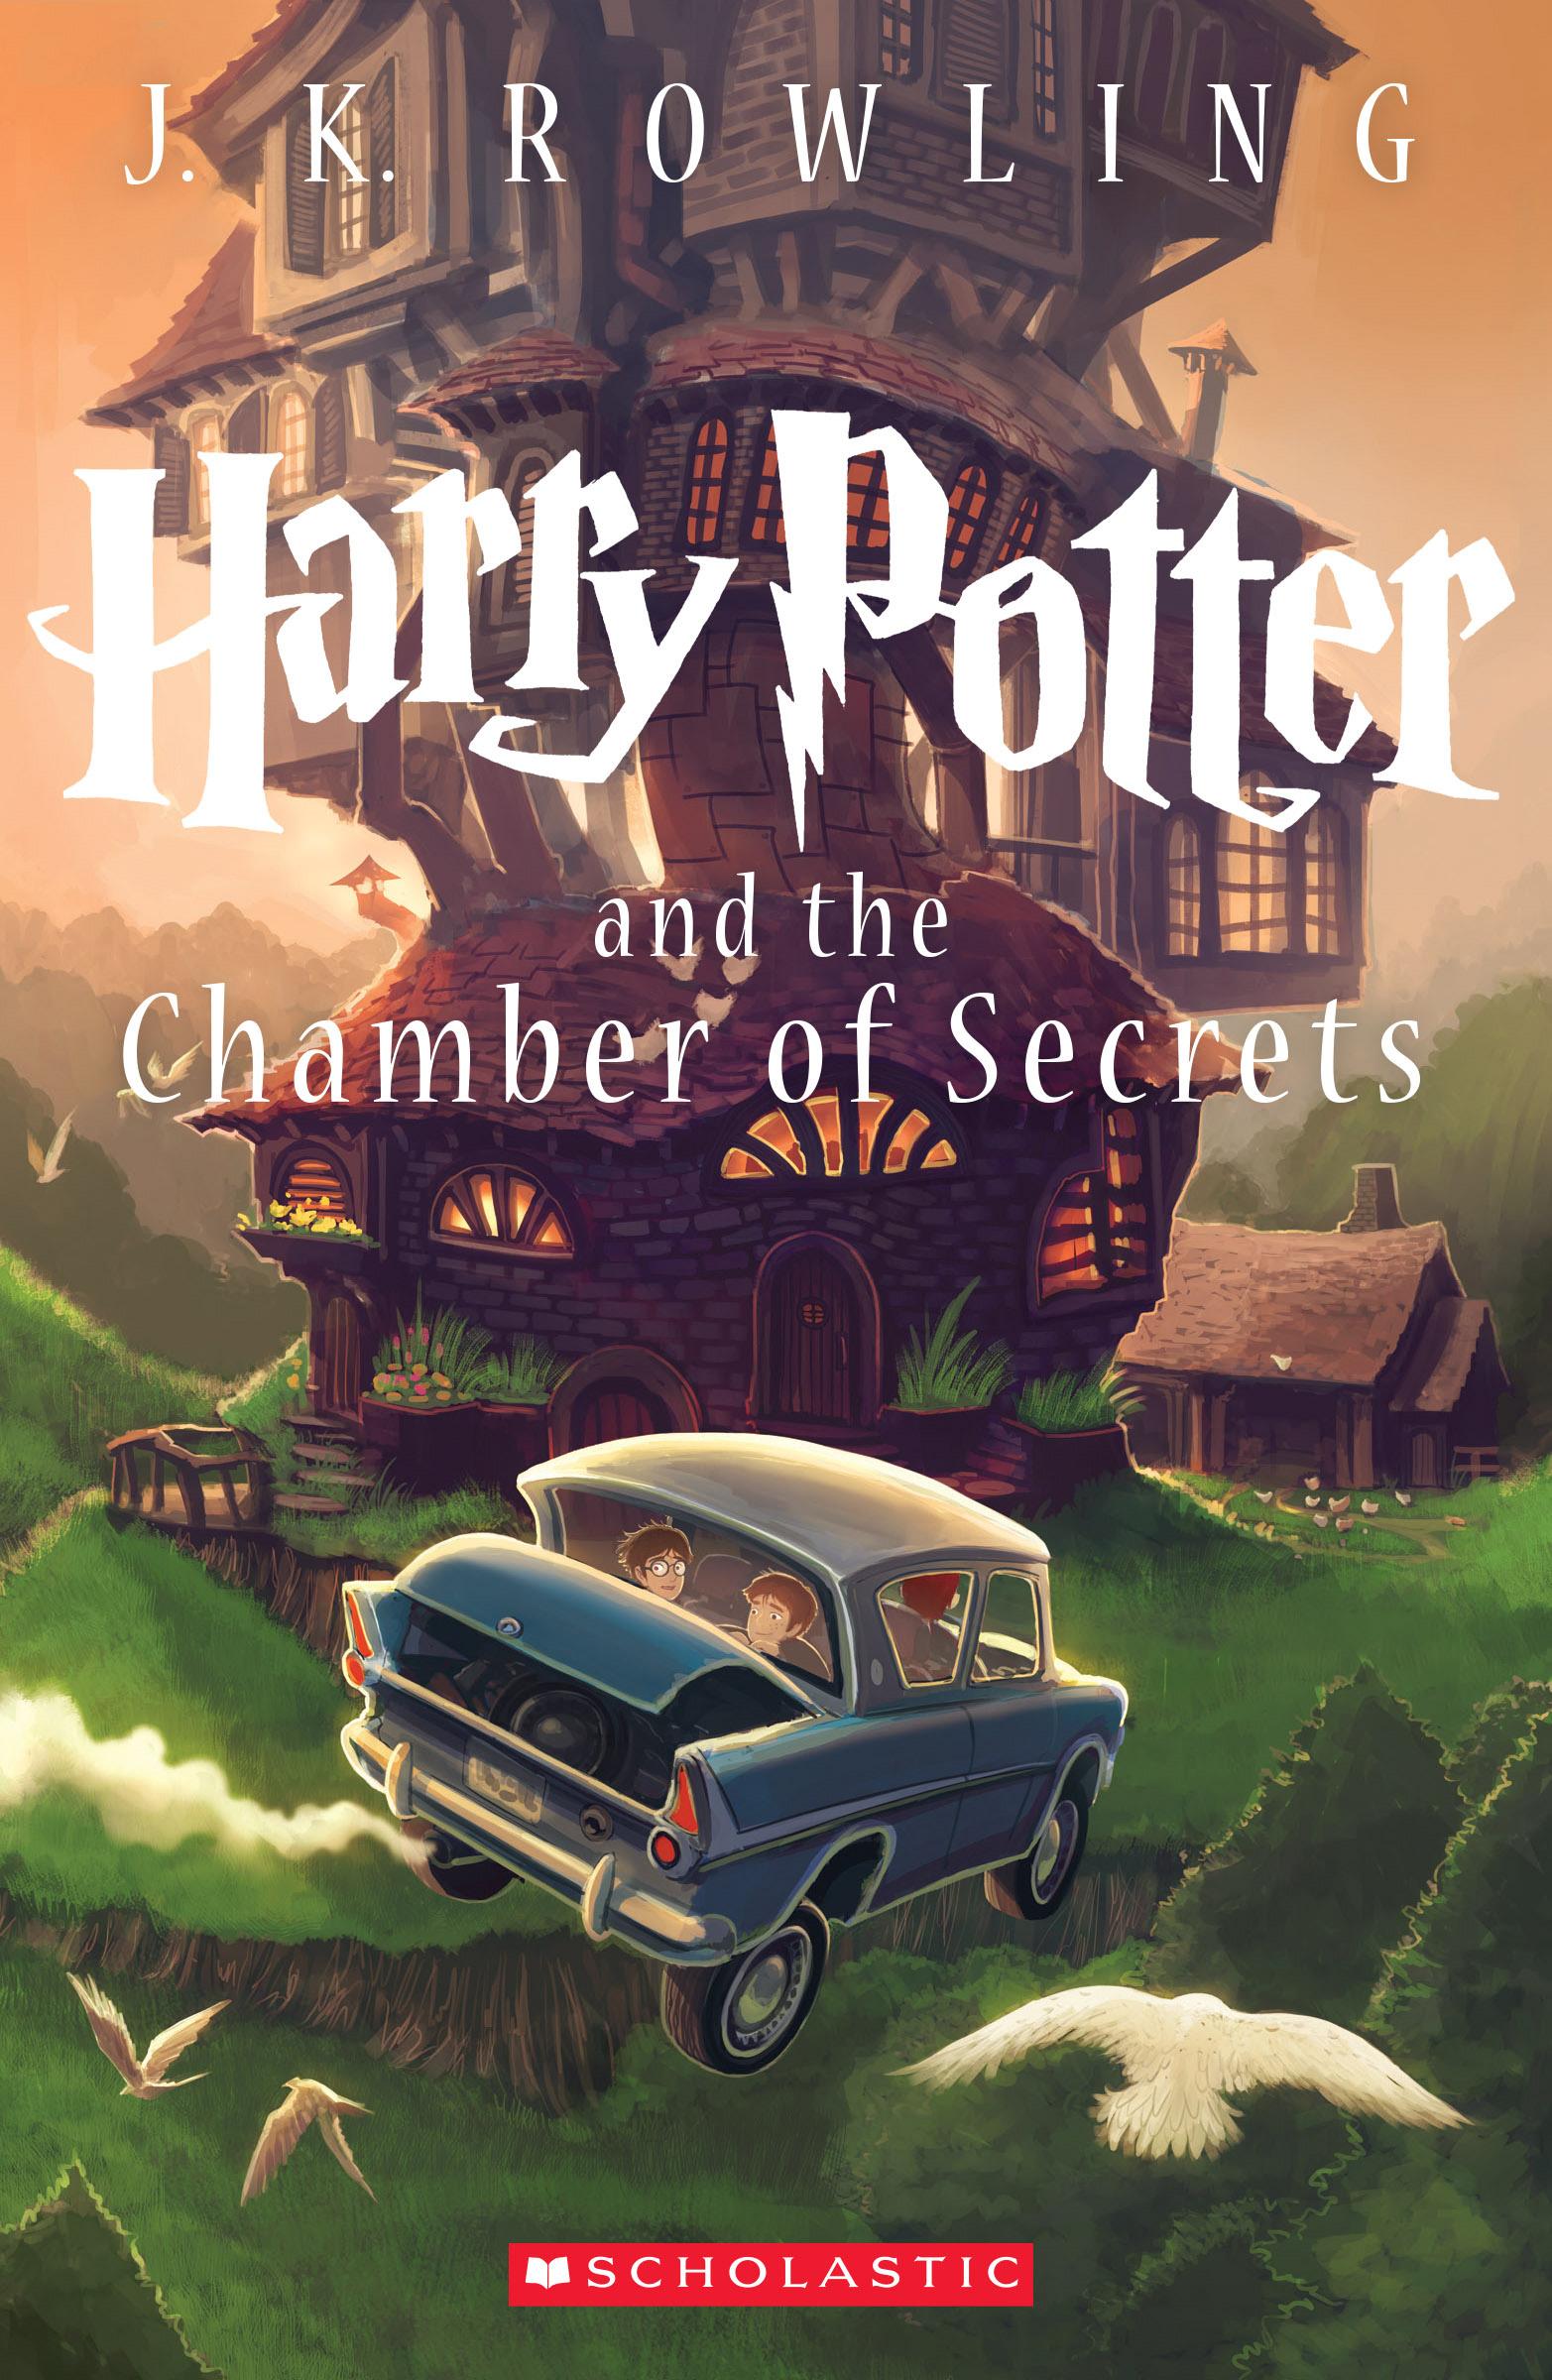 Harry Potter   Scholastic Media Room Harry Potter 2 Book